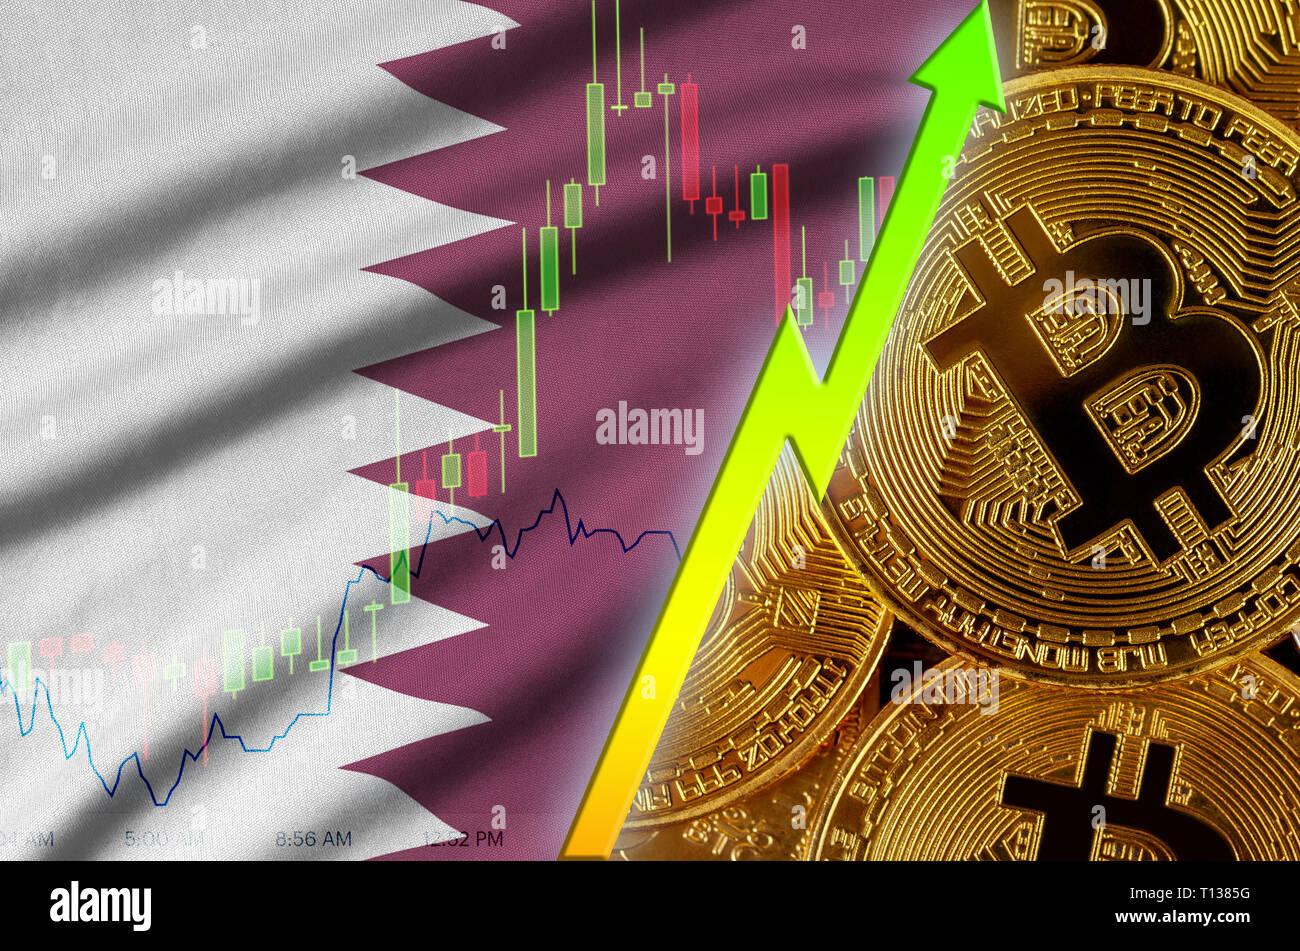 Qatar Waving Flag Stock Photos & Qatar Waving Flag Stock Images - Alamy